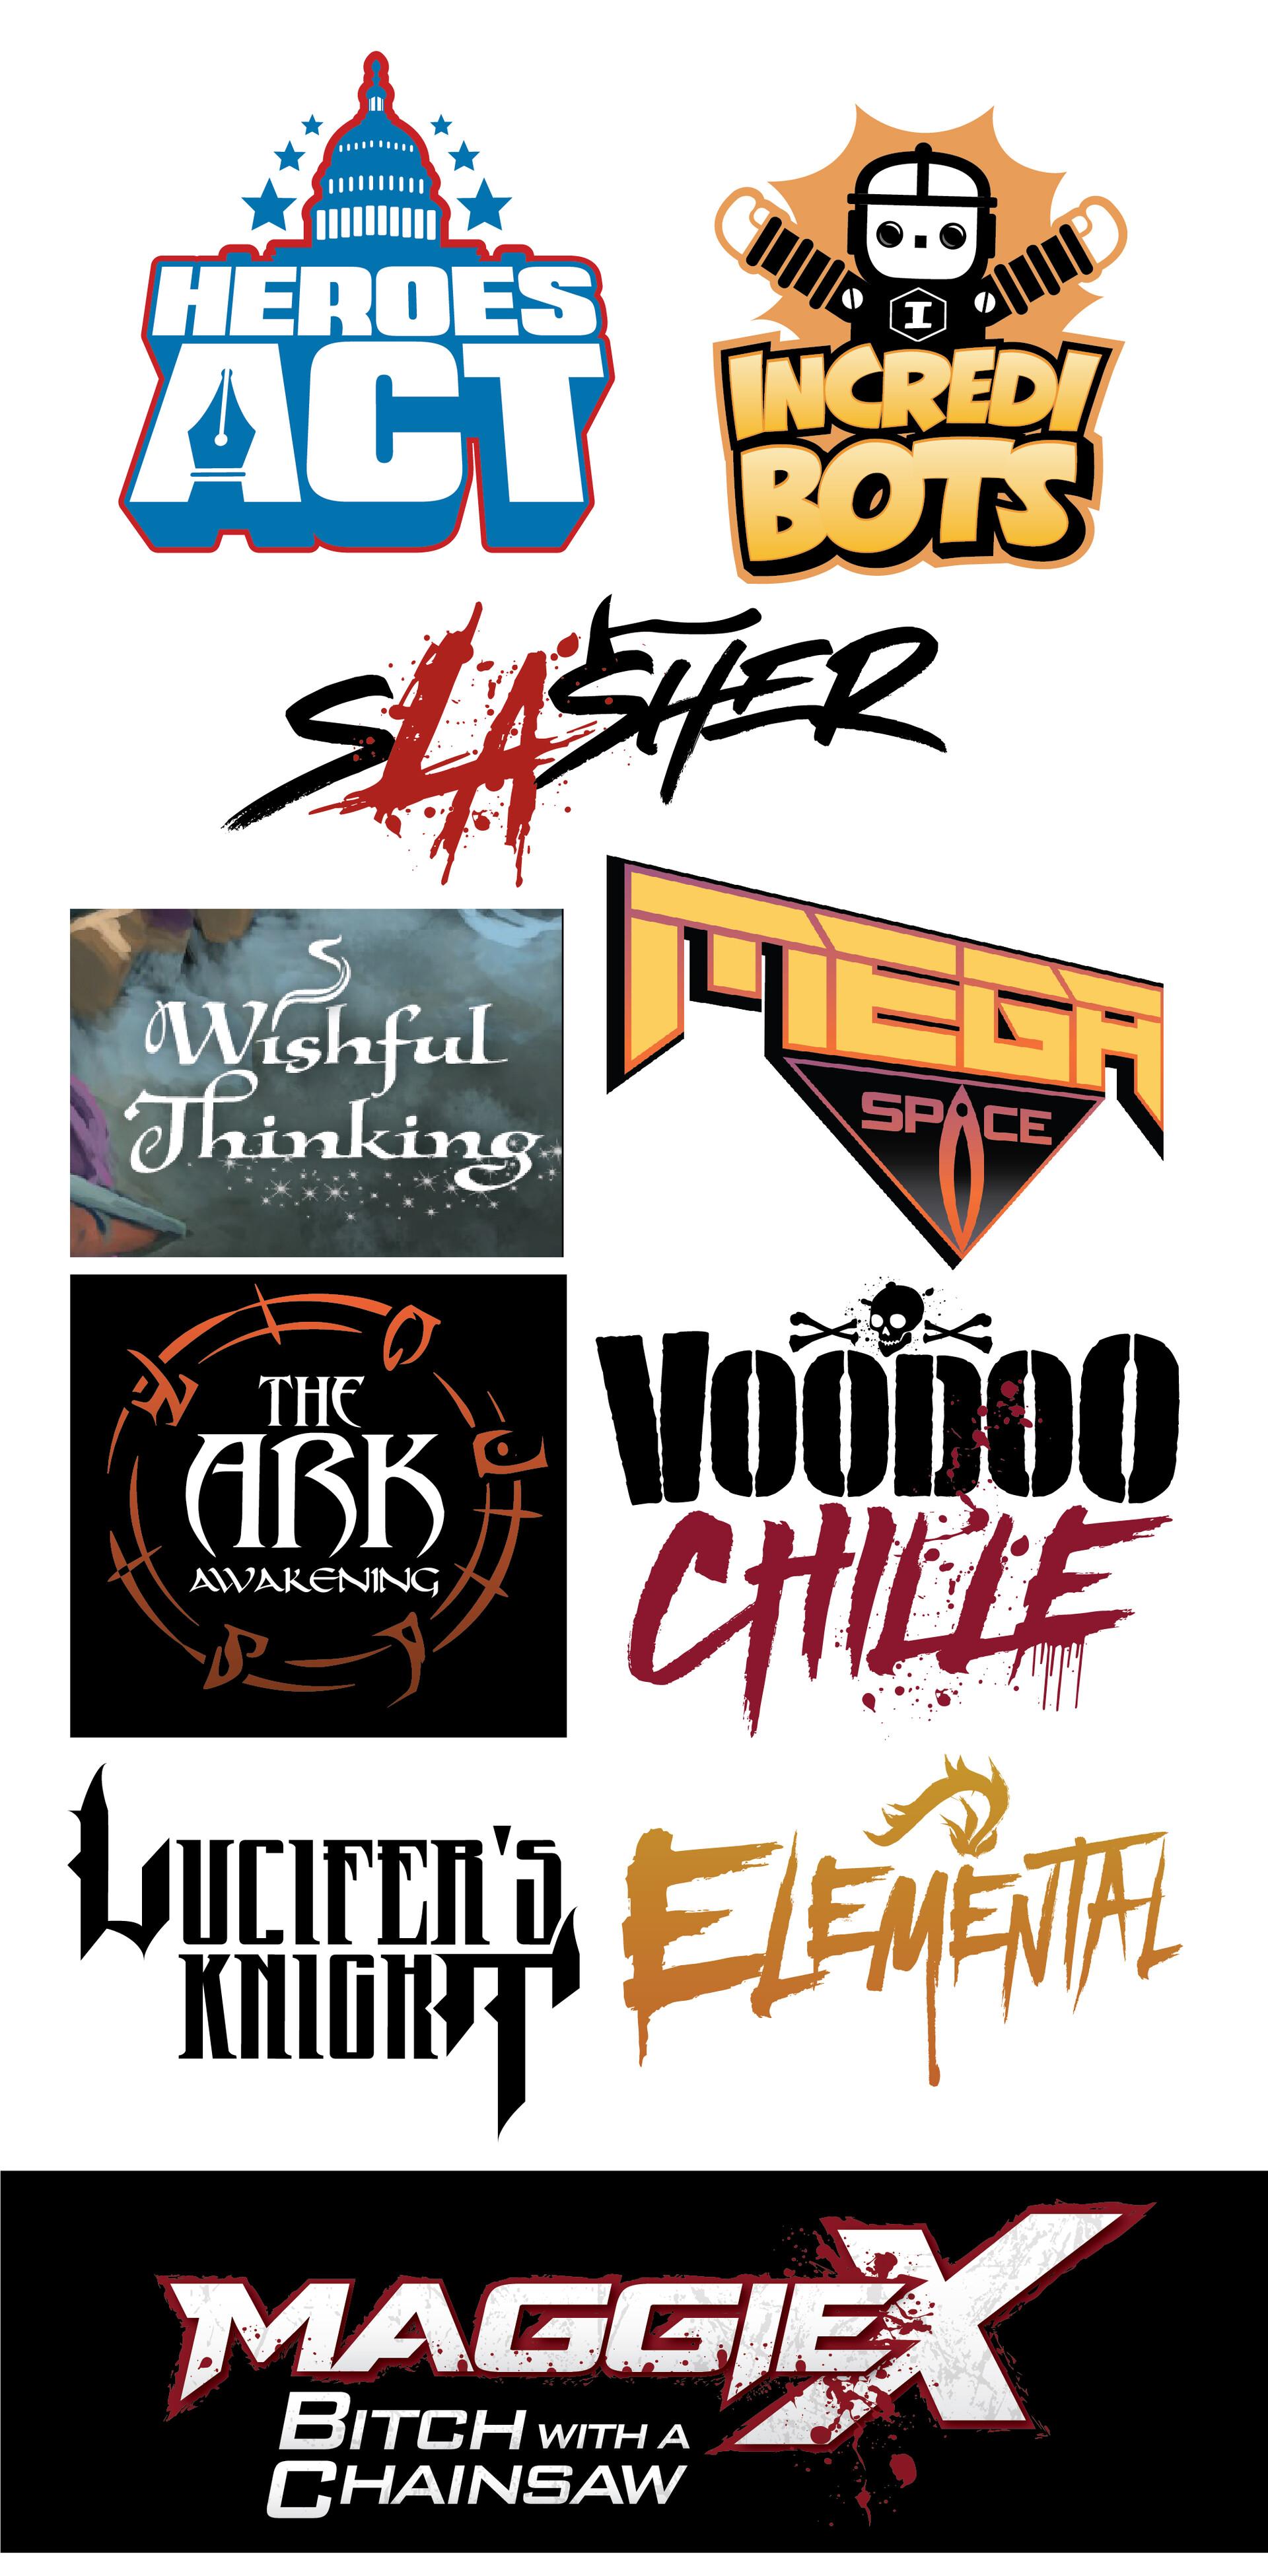 Justin lettersquids logos 01